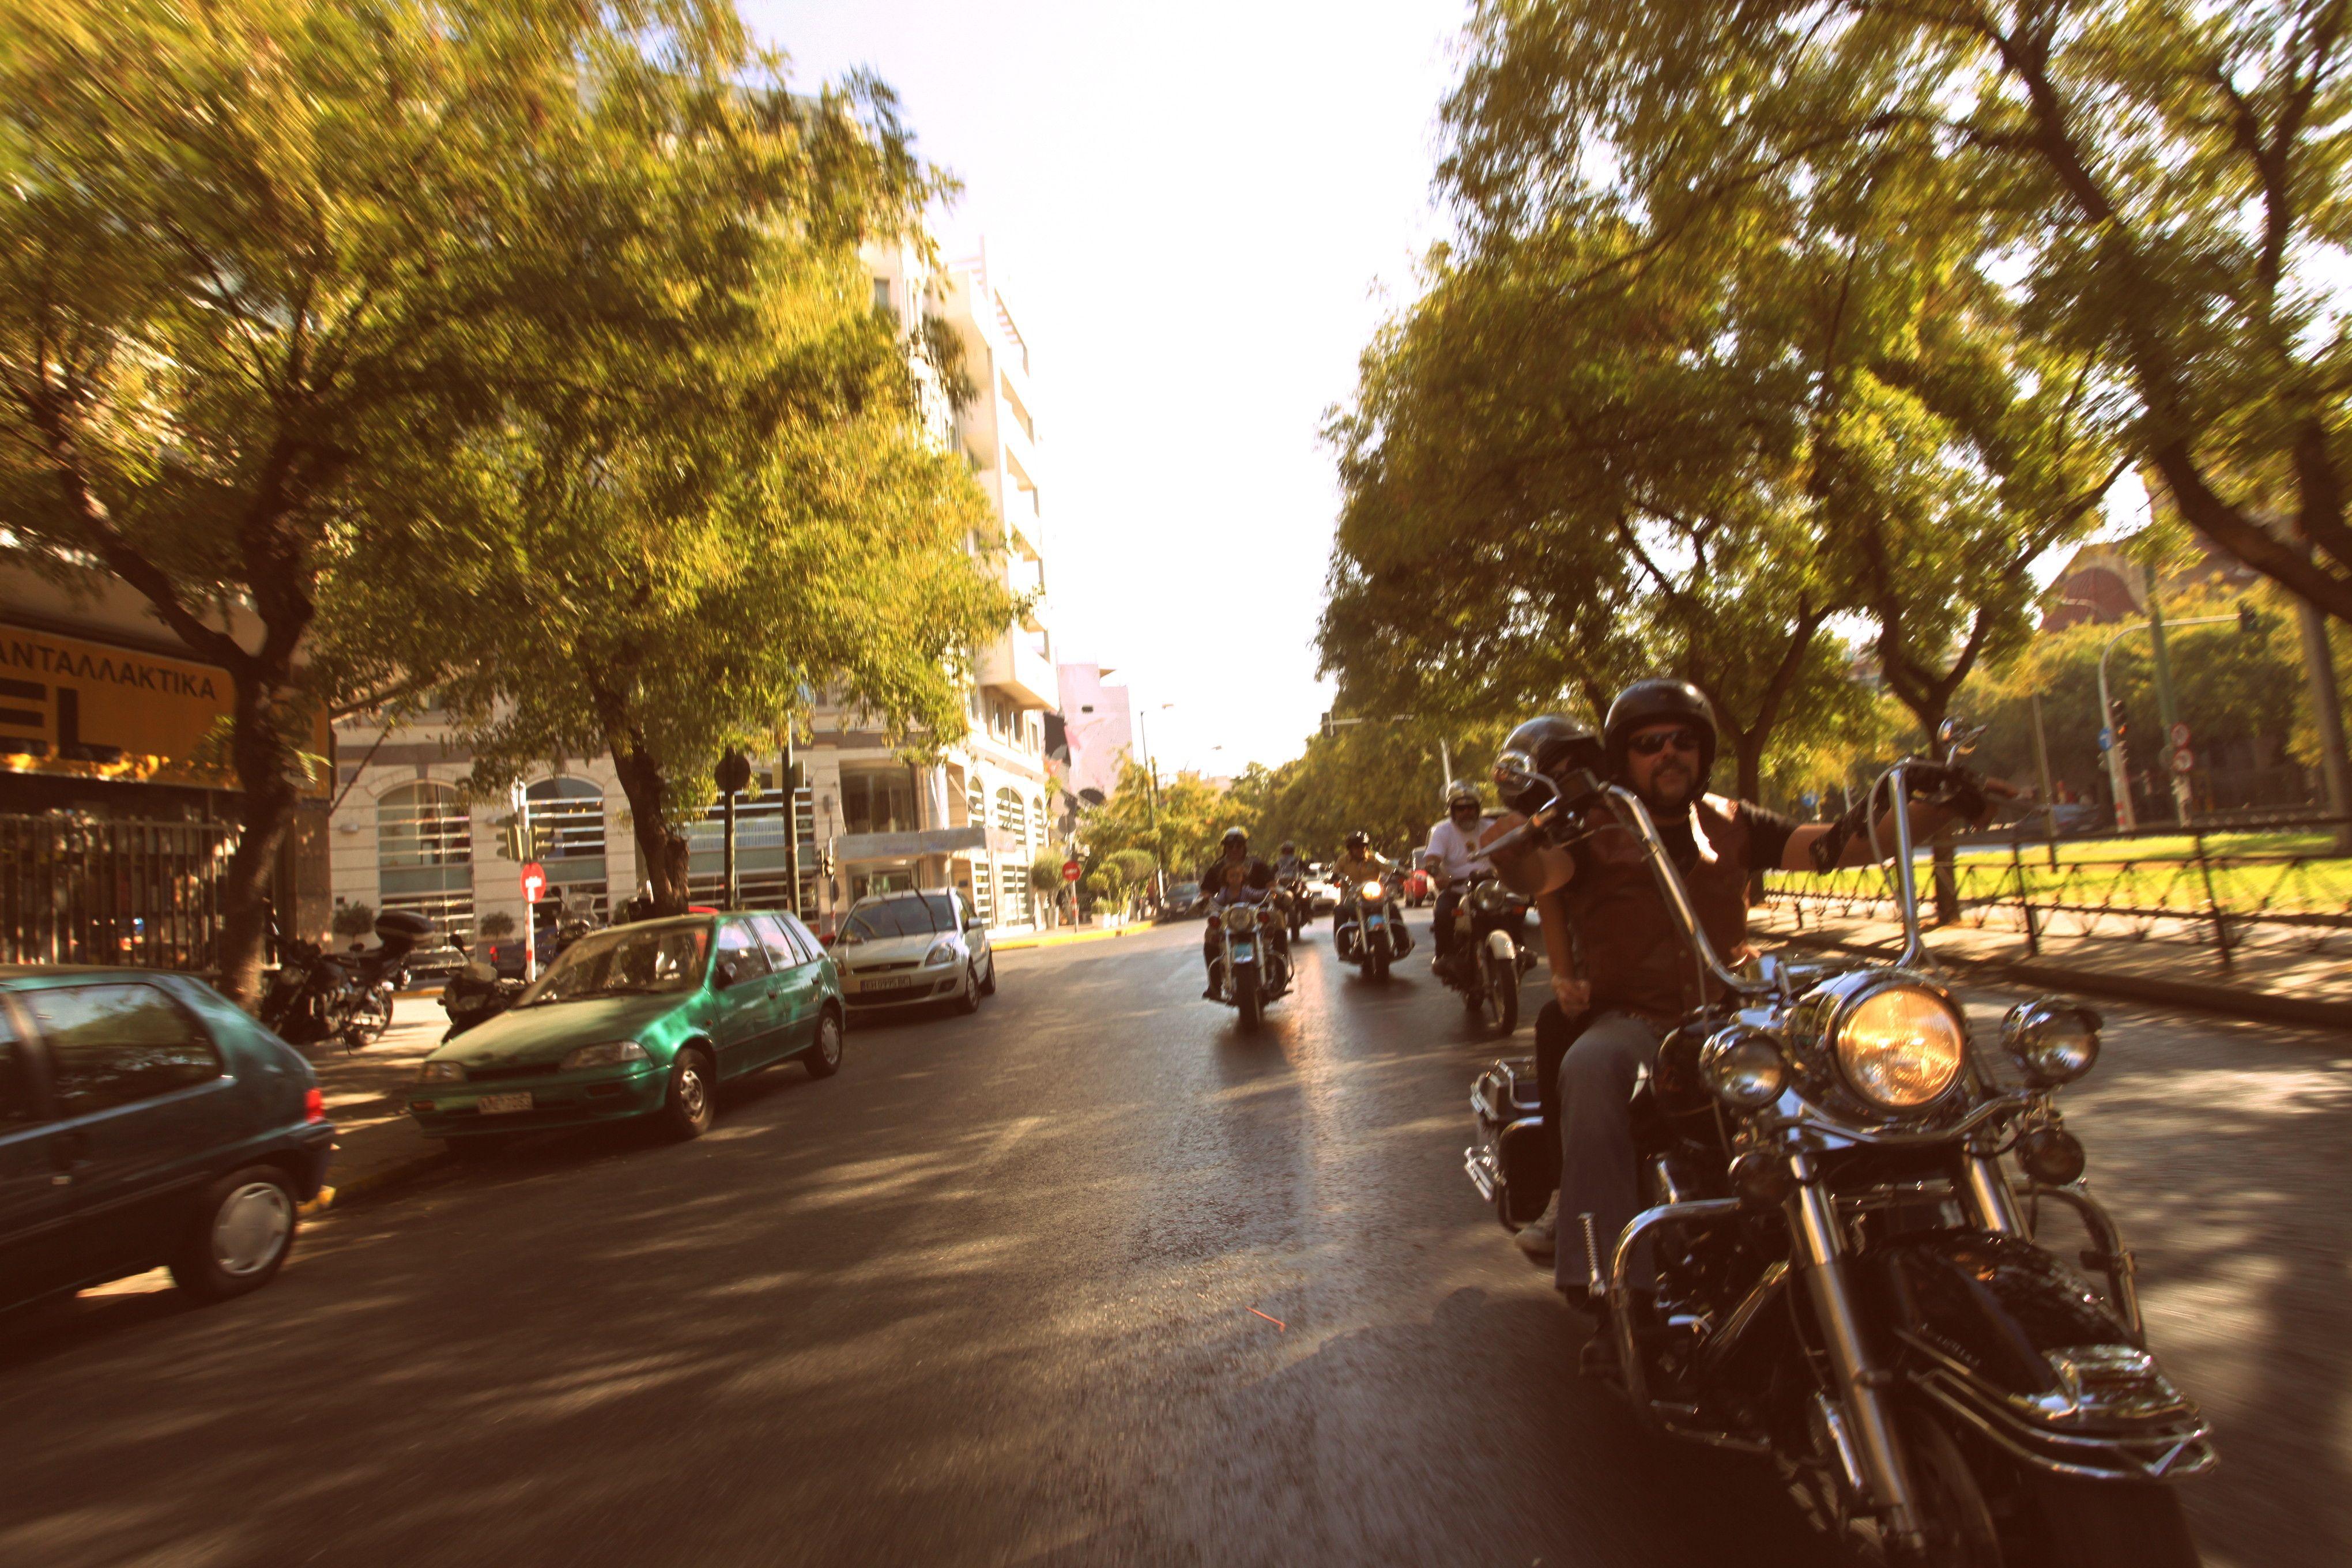 Athens dgr 2013 riding athens moped